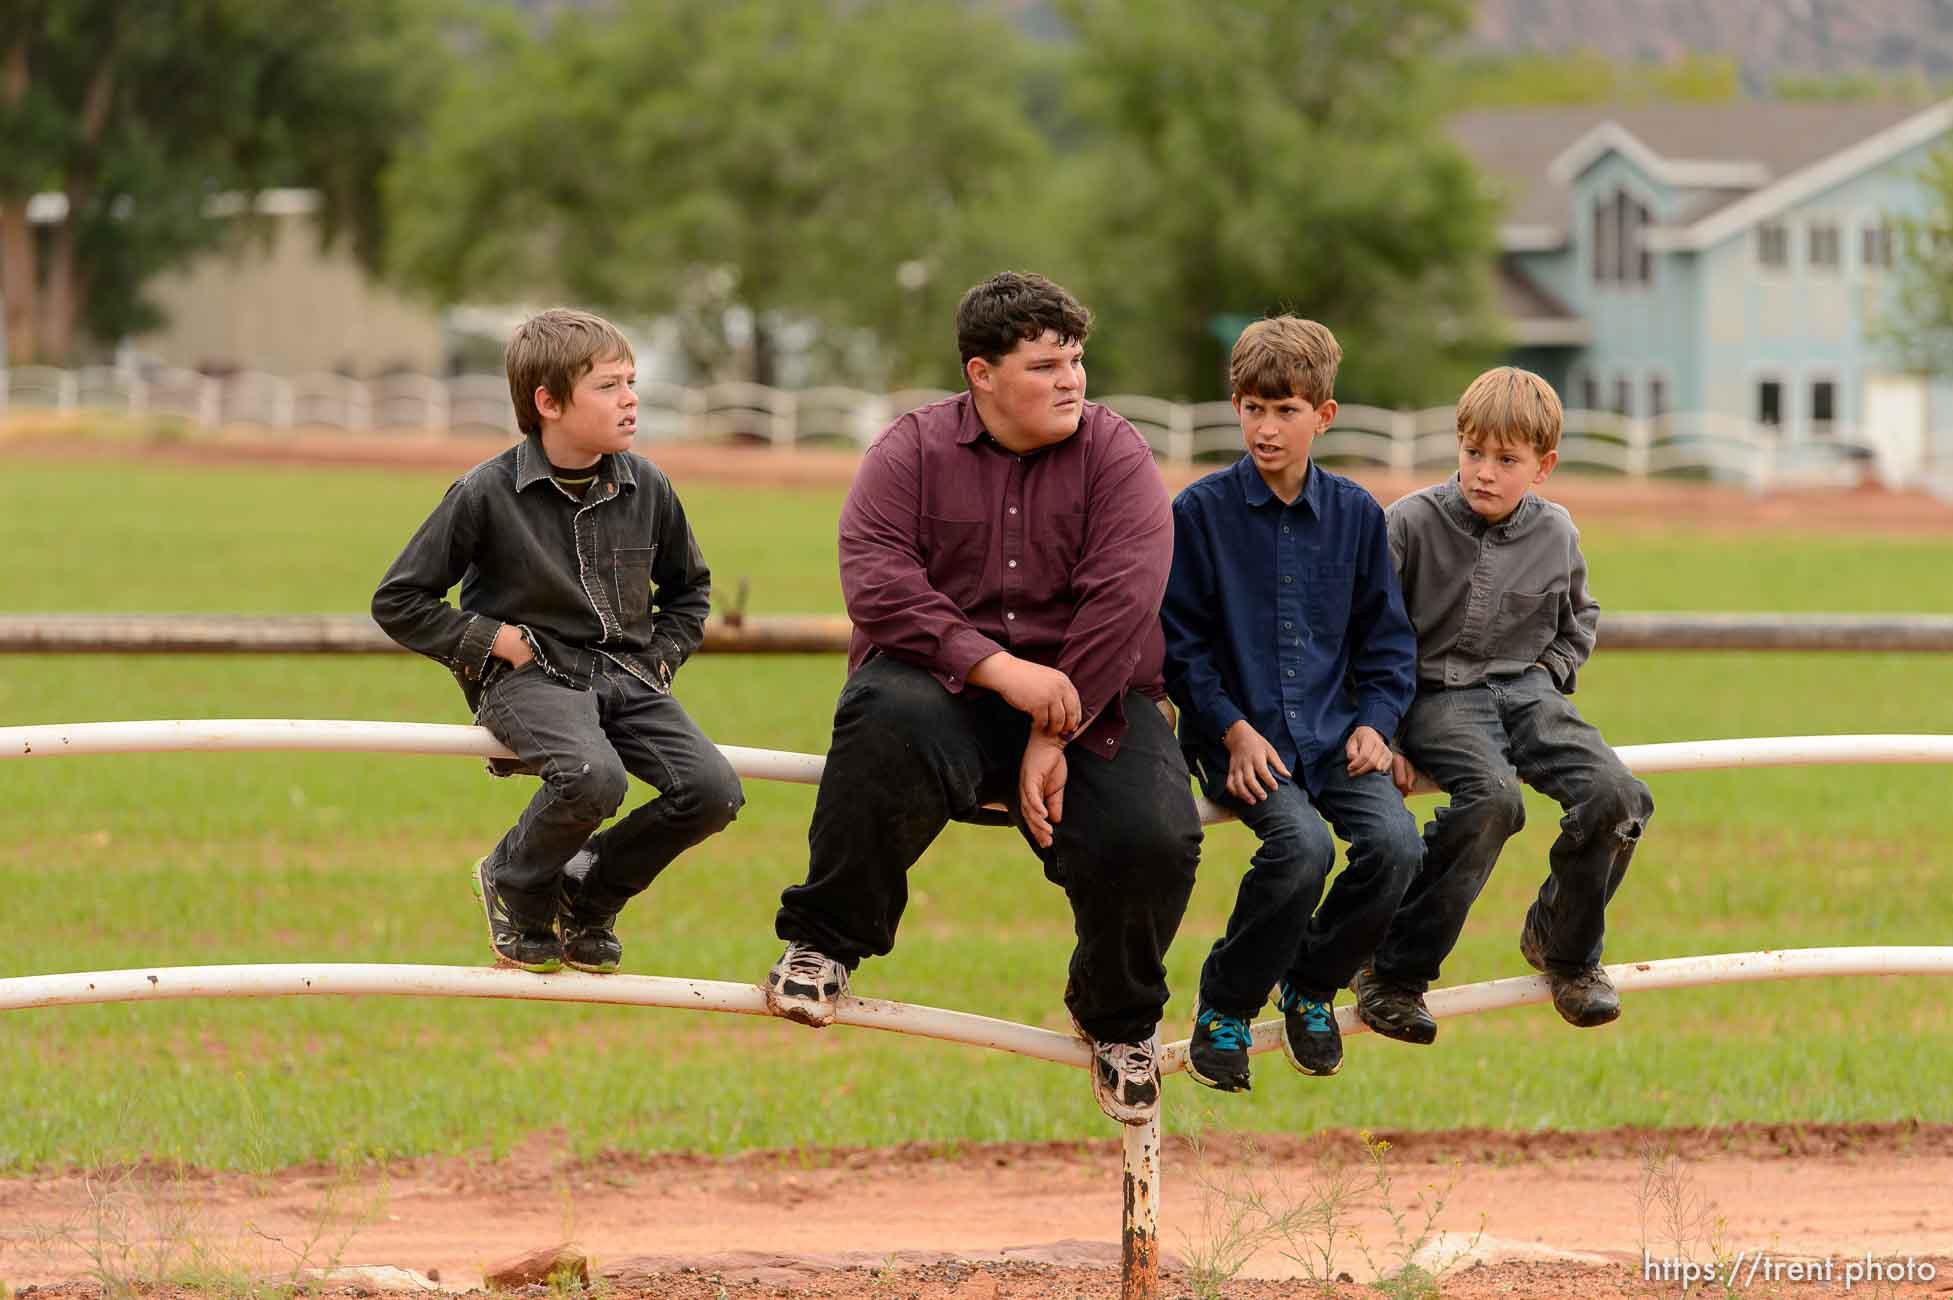 Trent Nelson   The Salt Lake Tribune UEP eviction of property at 555 N Lauritzen Ave, Colorado City, AZ, Wednesday May 10, 2017. Four FLDS boys.